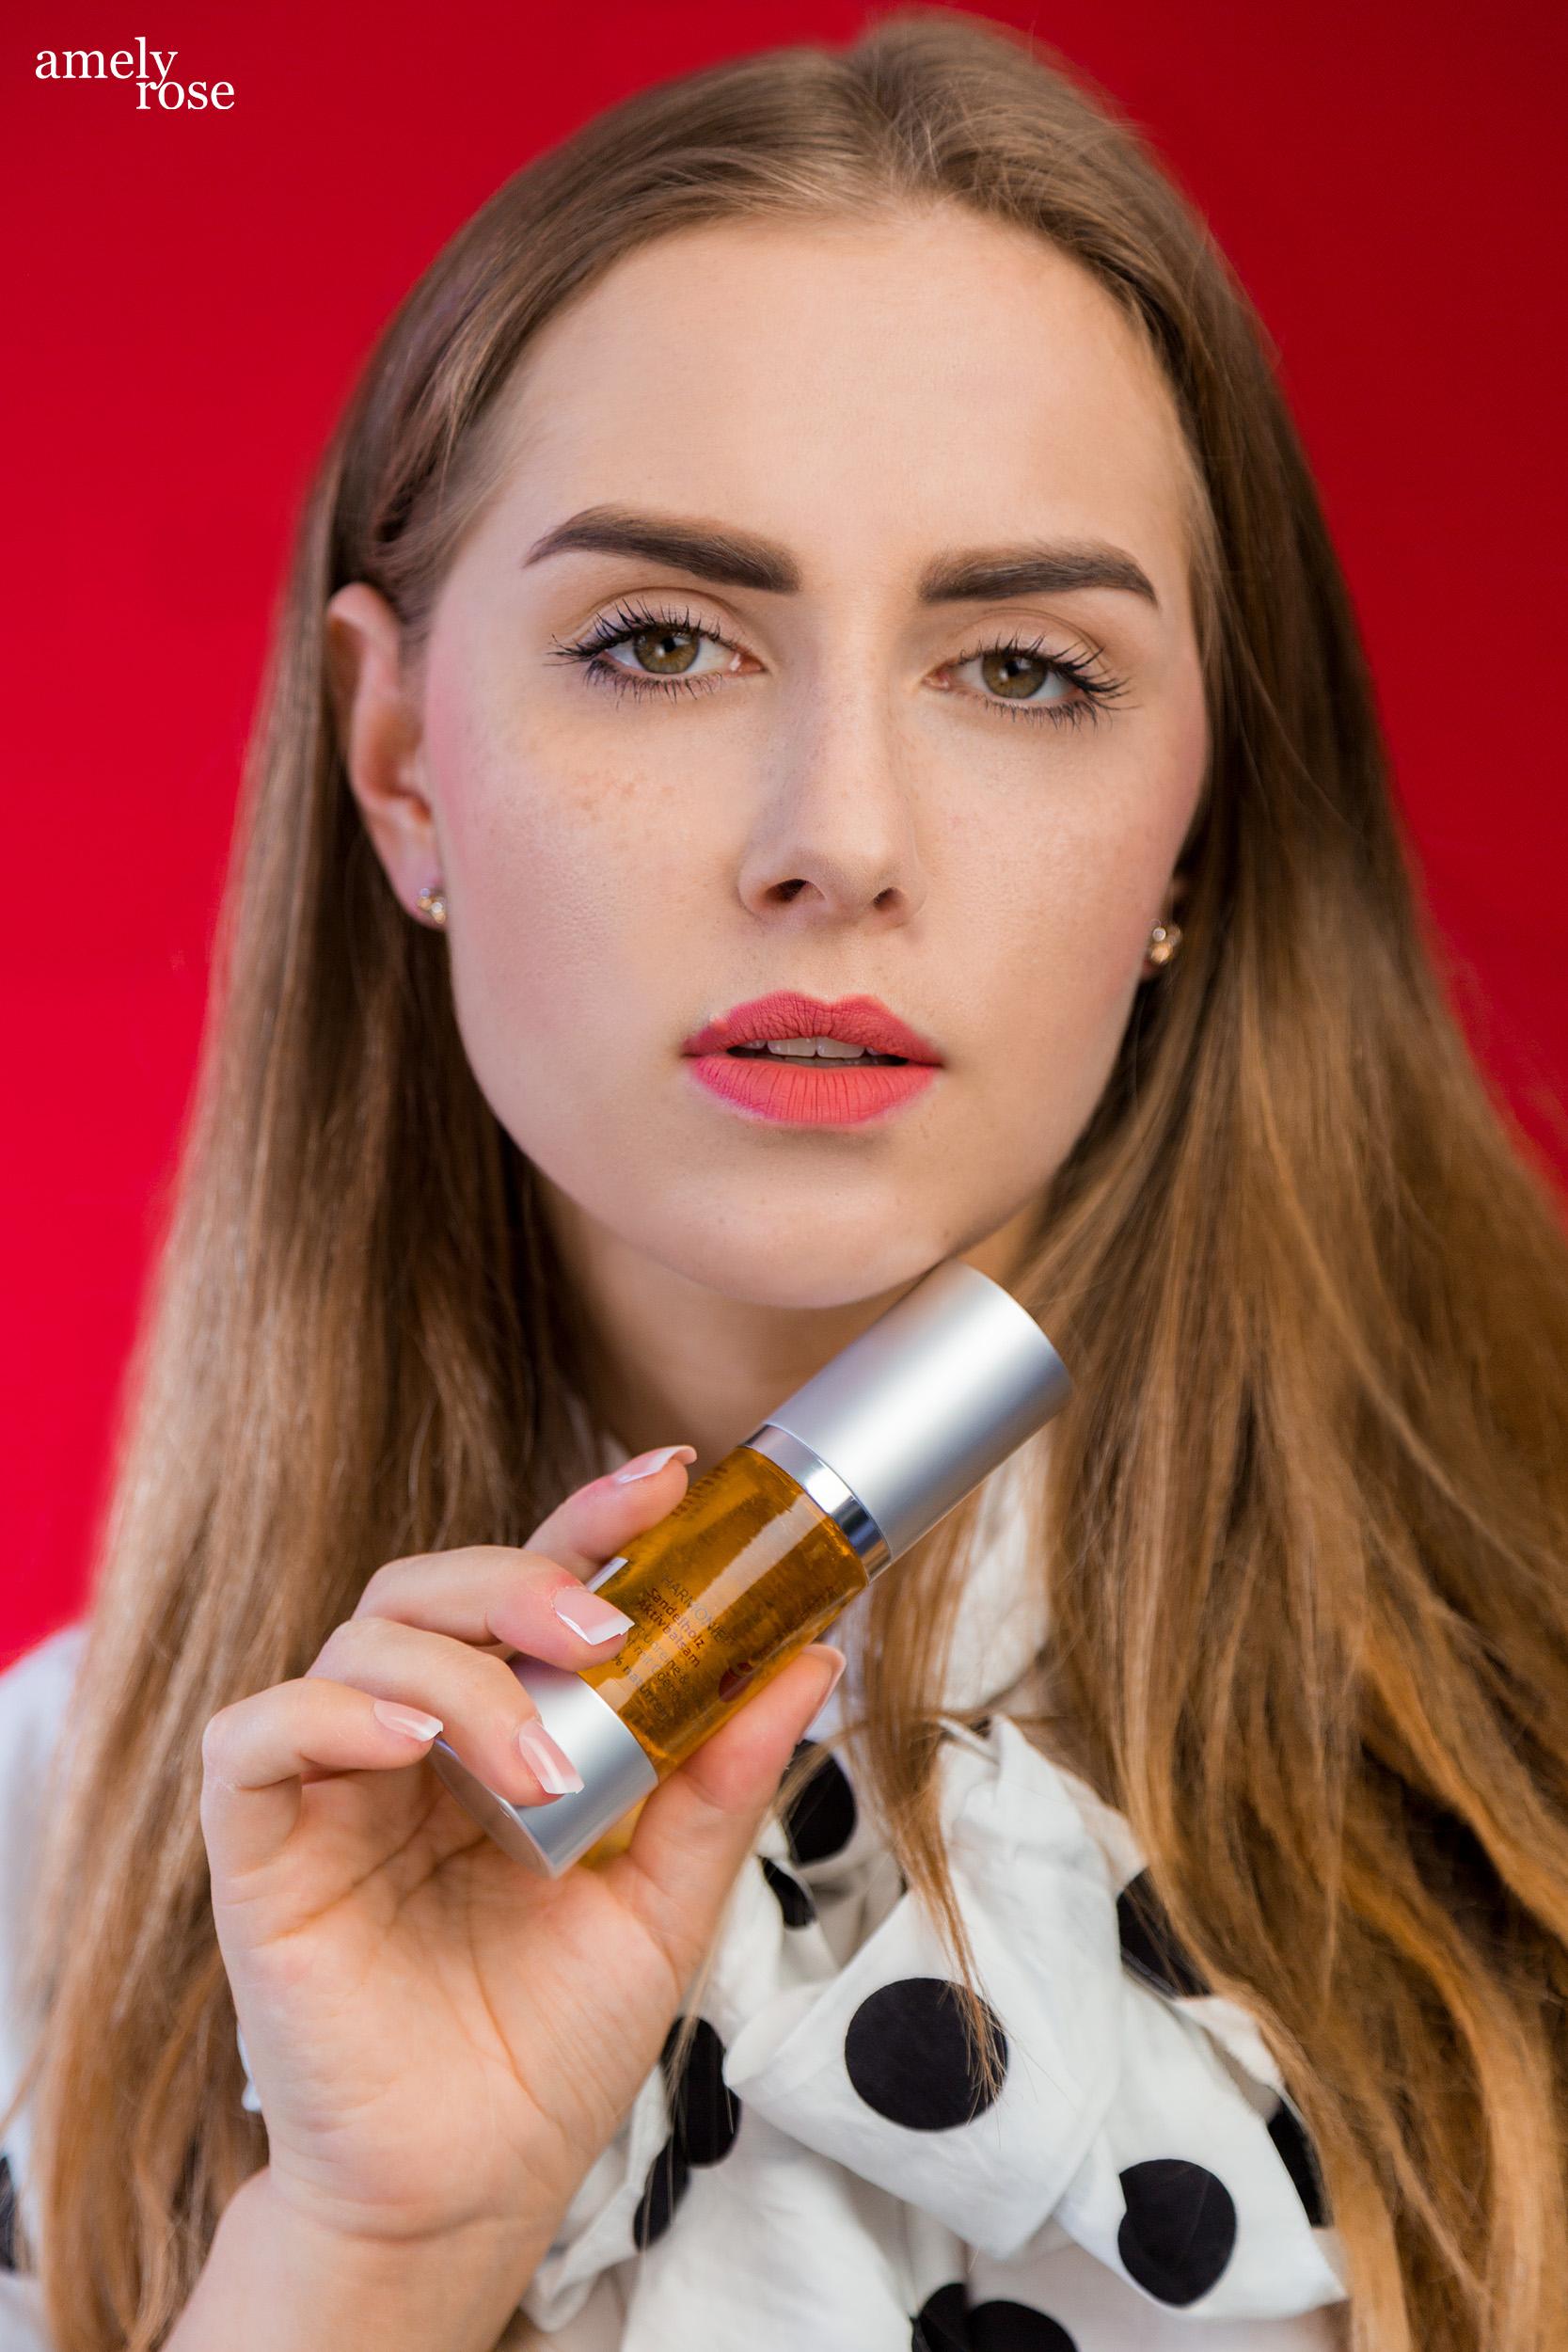 Amely Rose Naturkosmetik Beauty Produkte Guide Gesichtspflege Fuer das Gute Leben